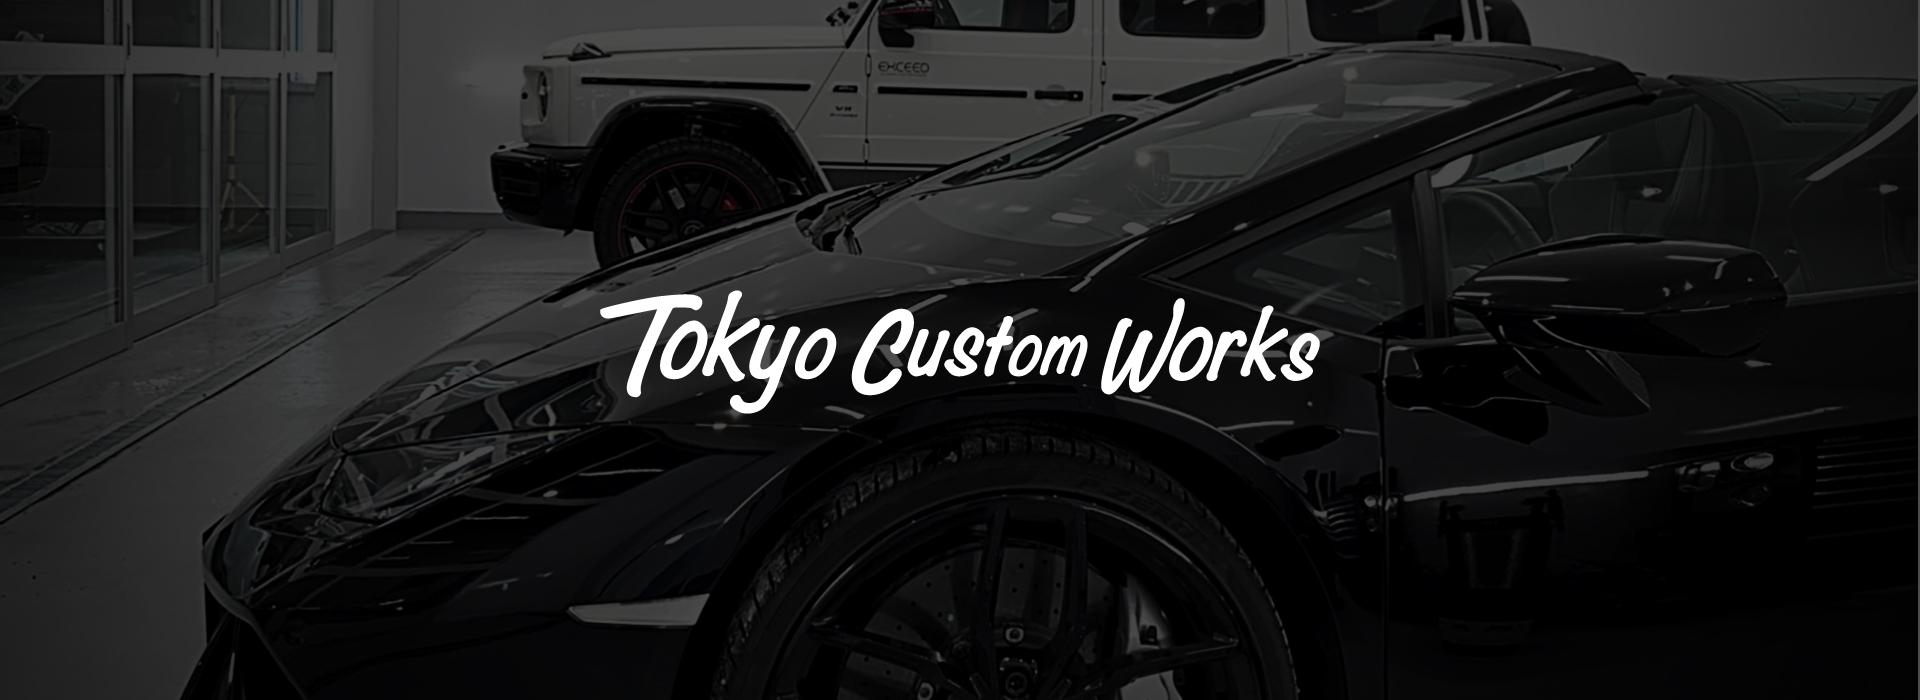 TokyoCustomWorks